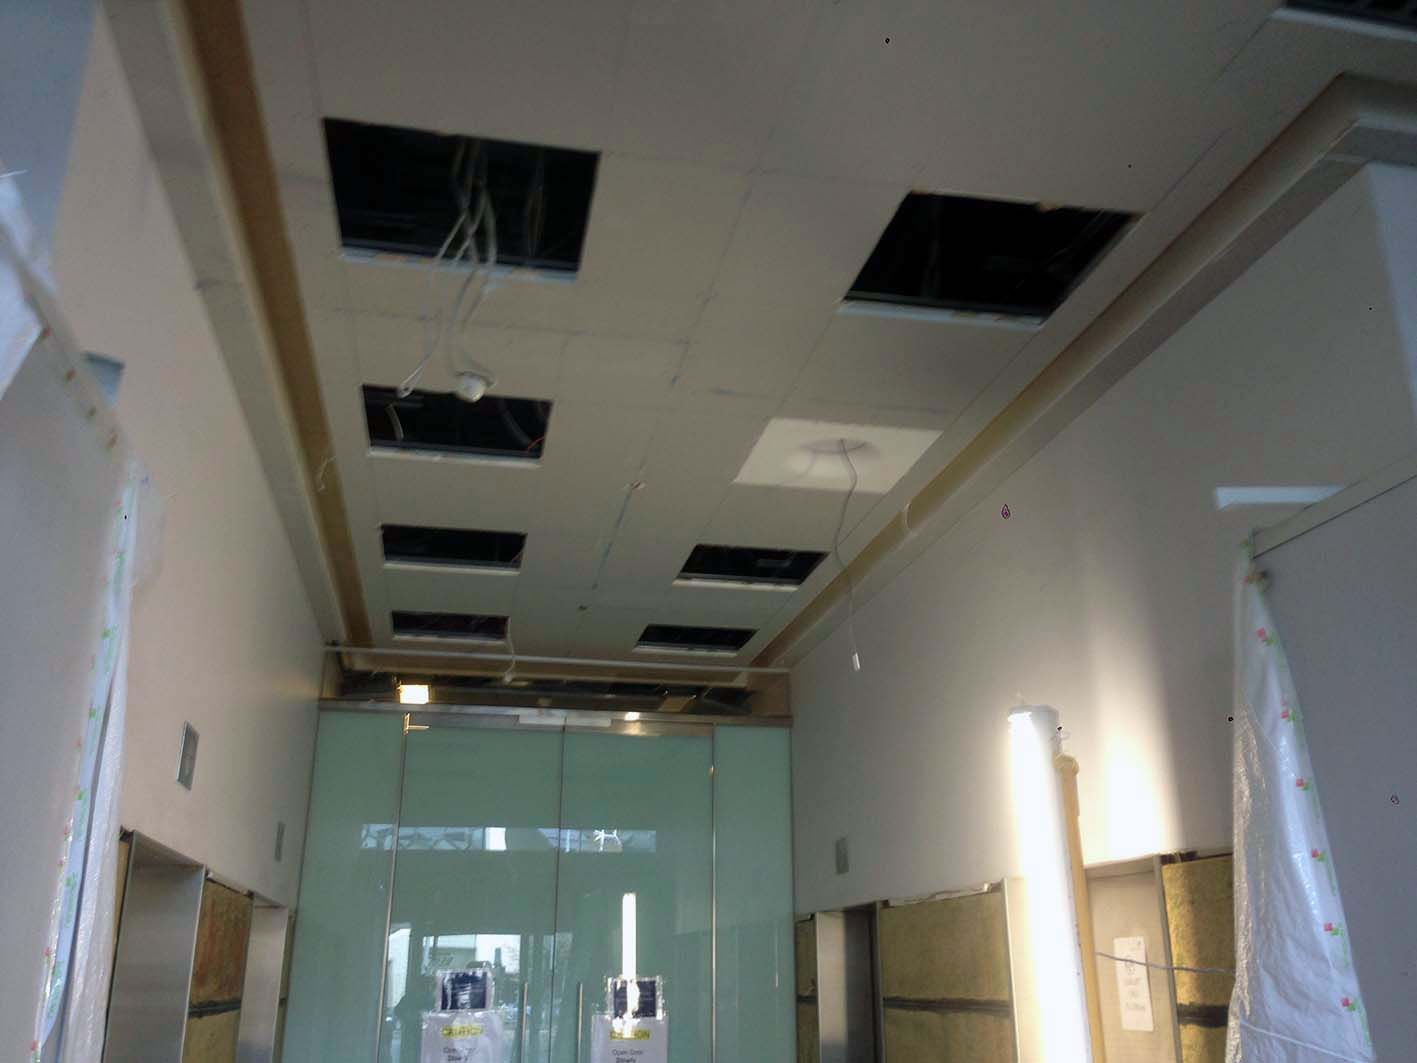 Foyer Lighting Jobs : Current job foyer commercial drywall talk